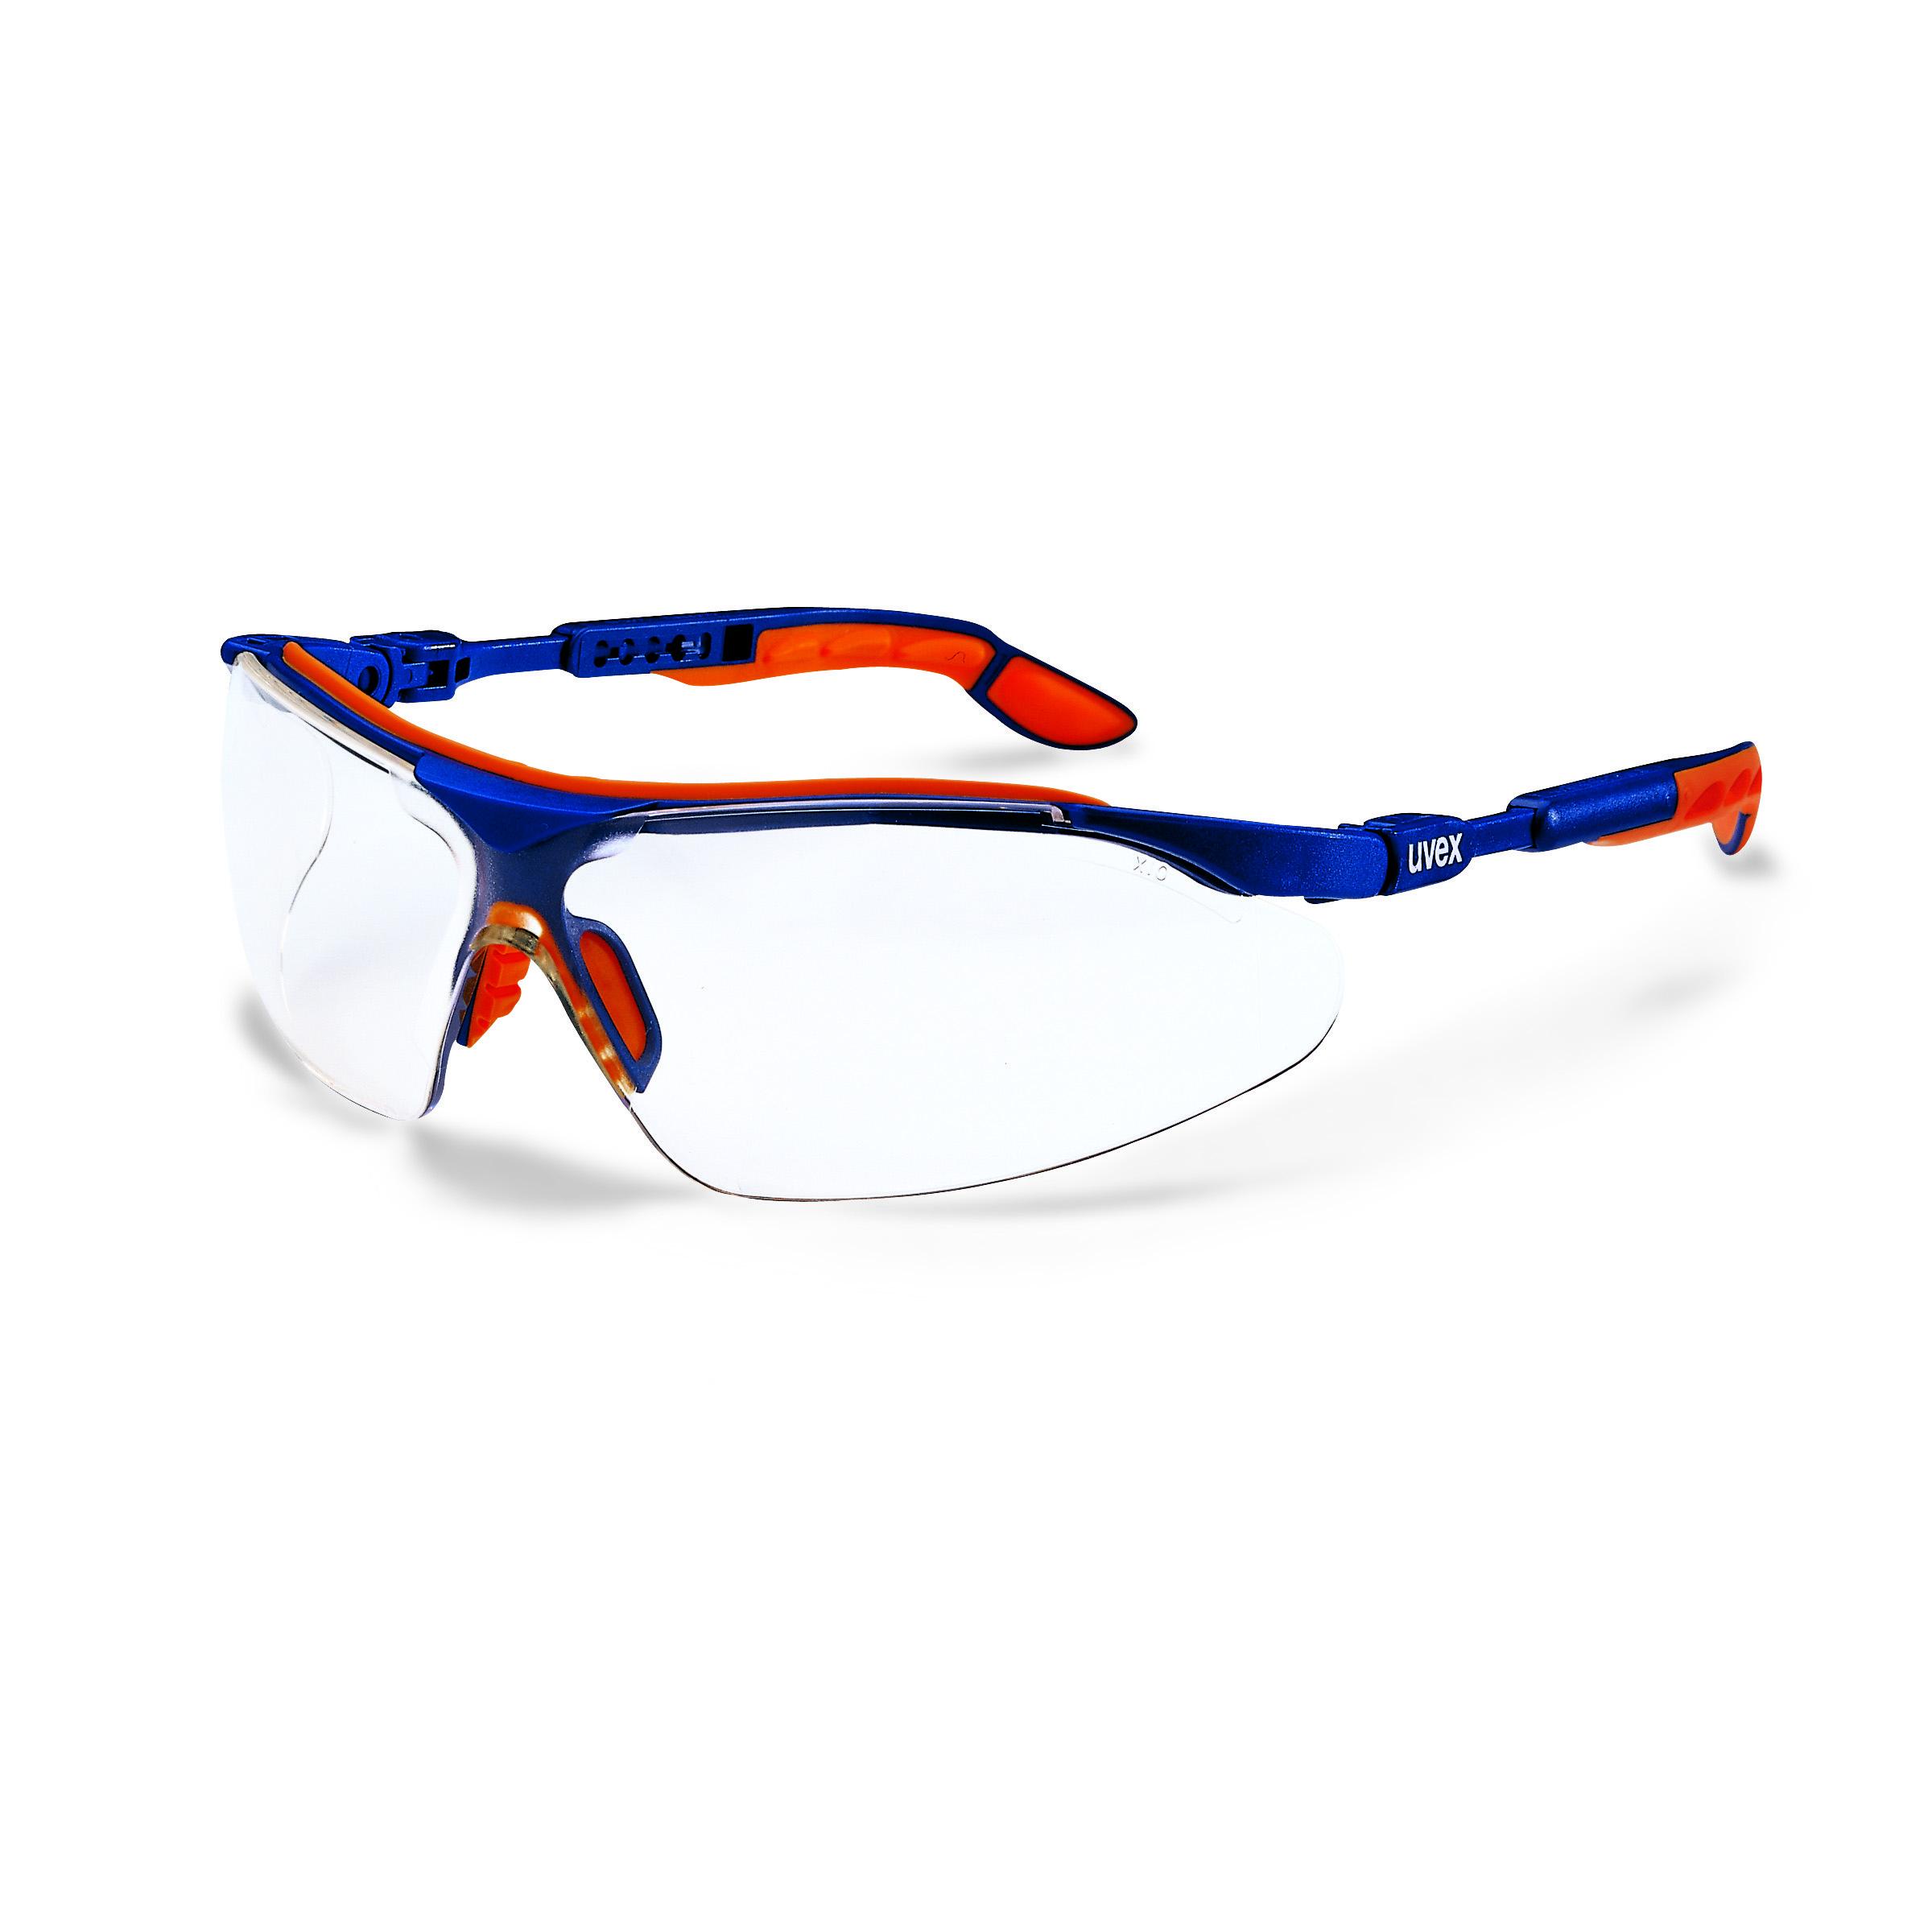 uvex 9160 - i-vo - Schutzbrille